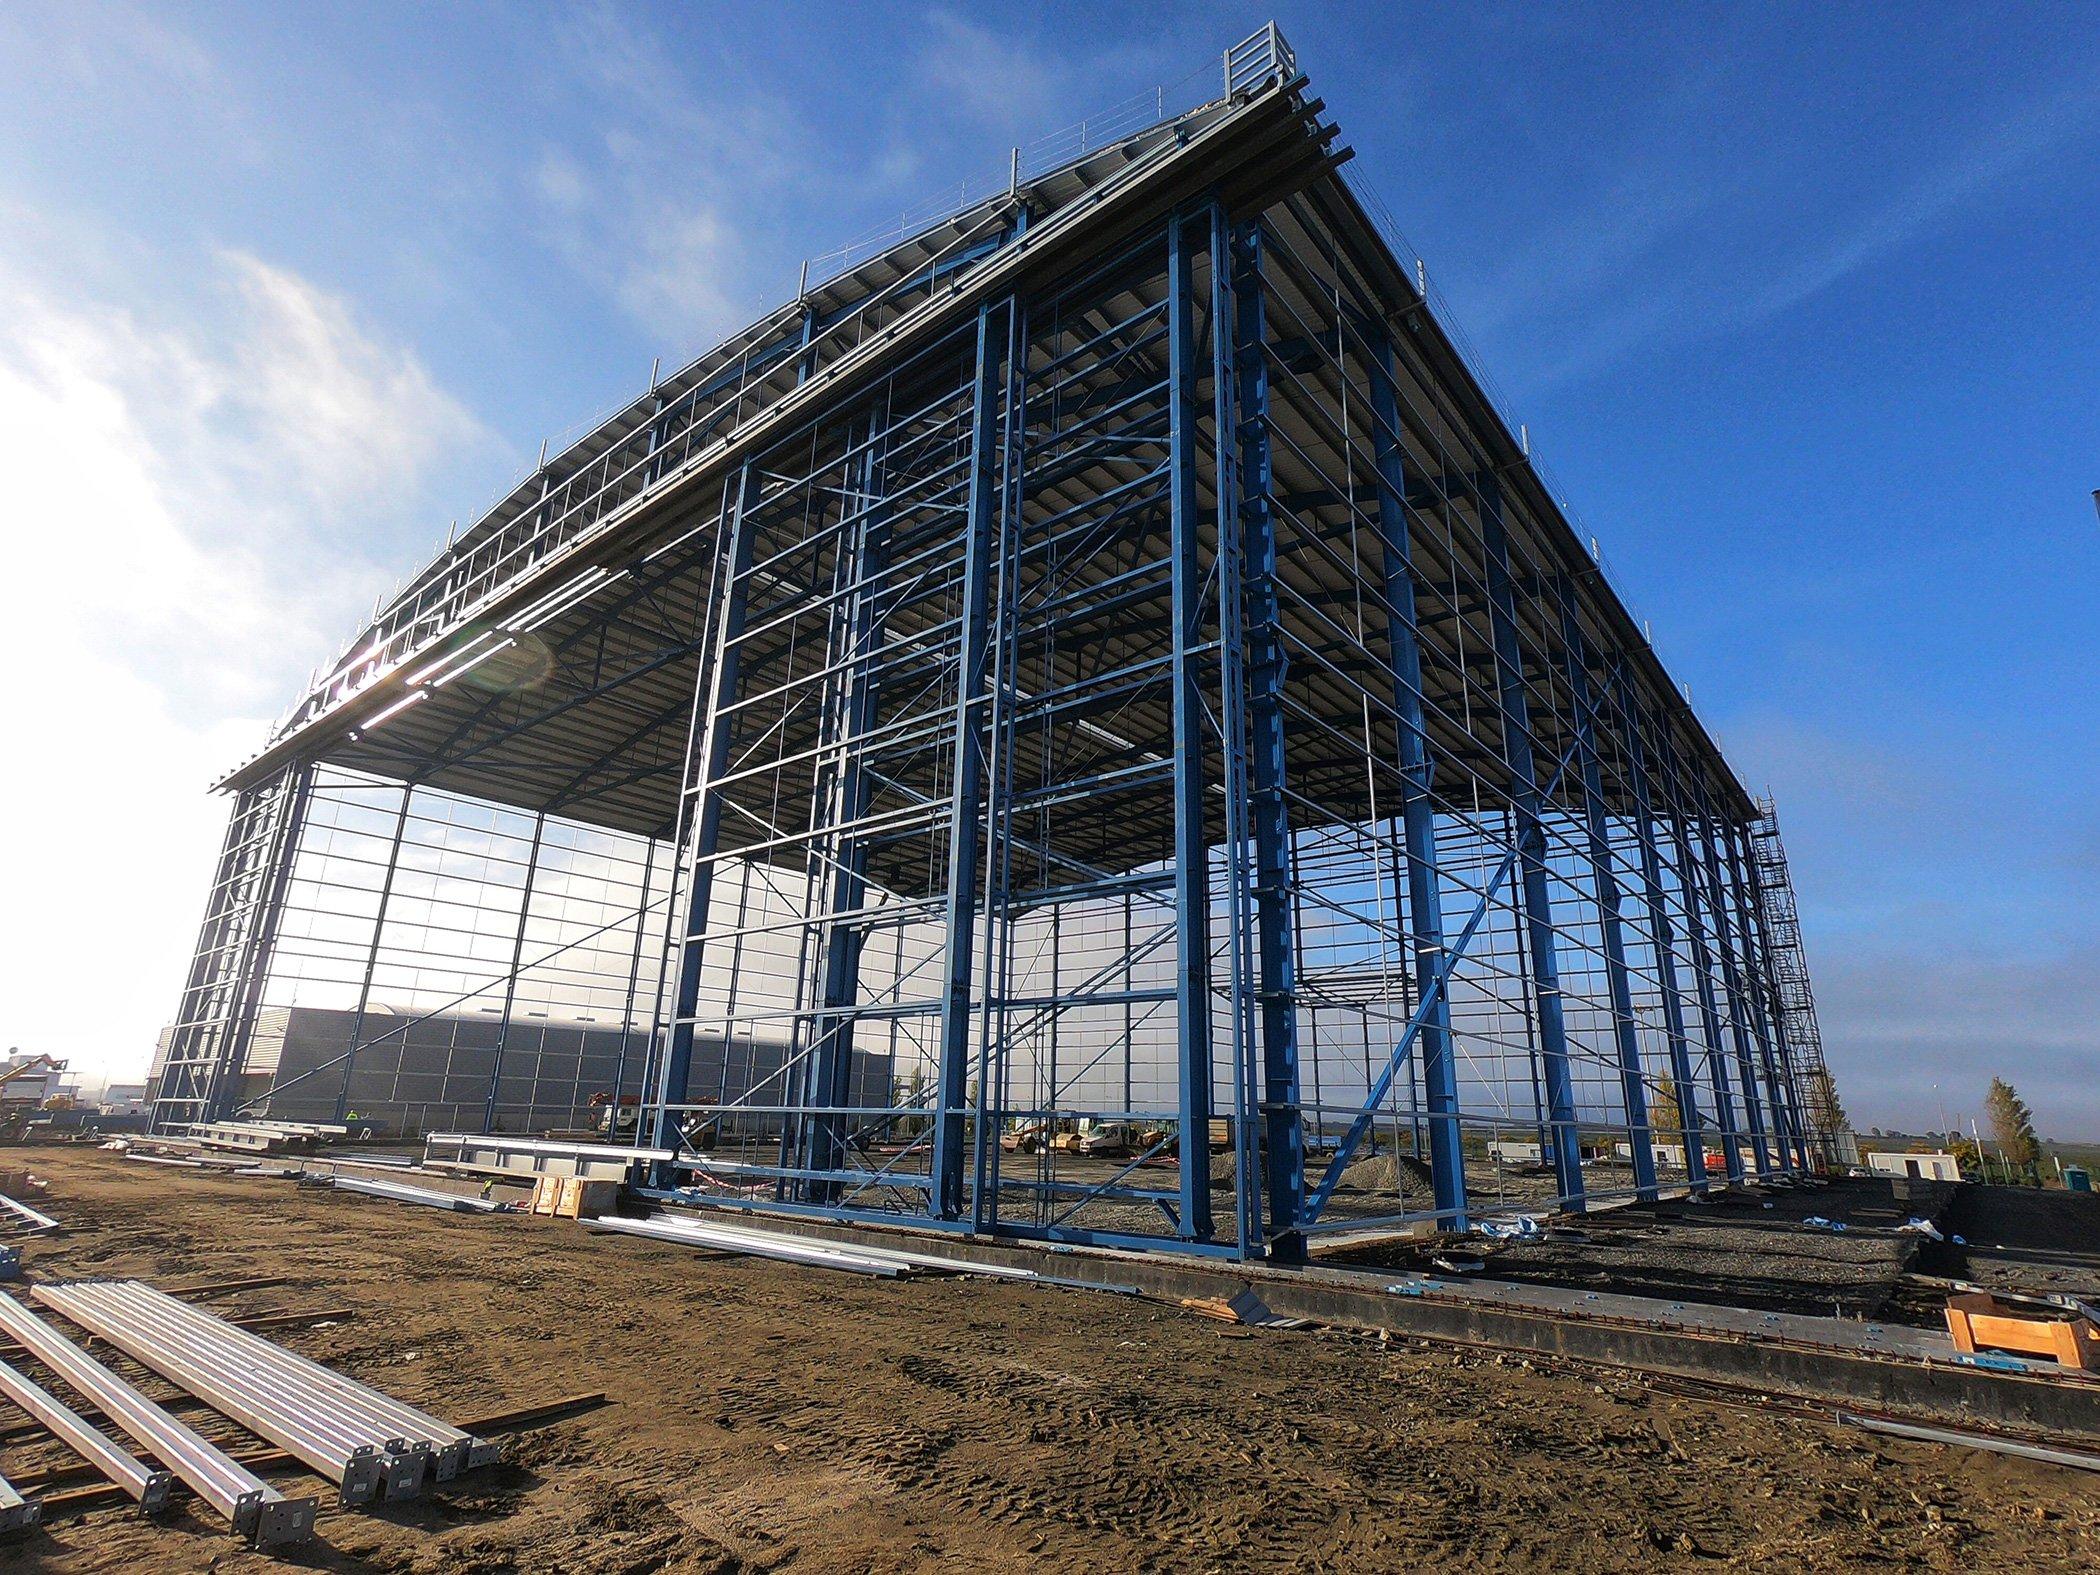 Beja Airport Hangar Development